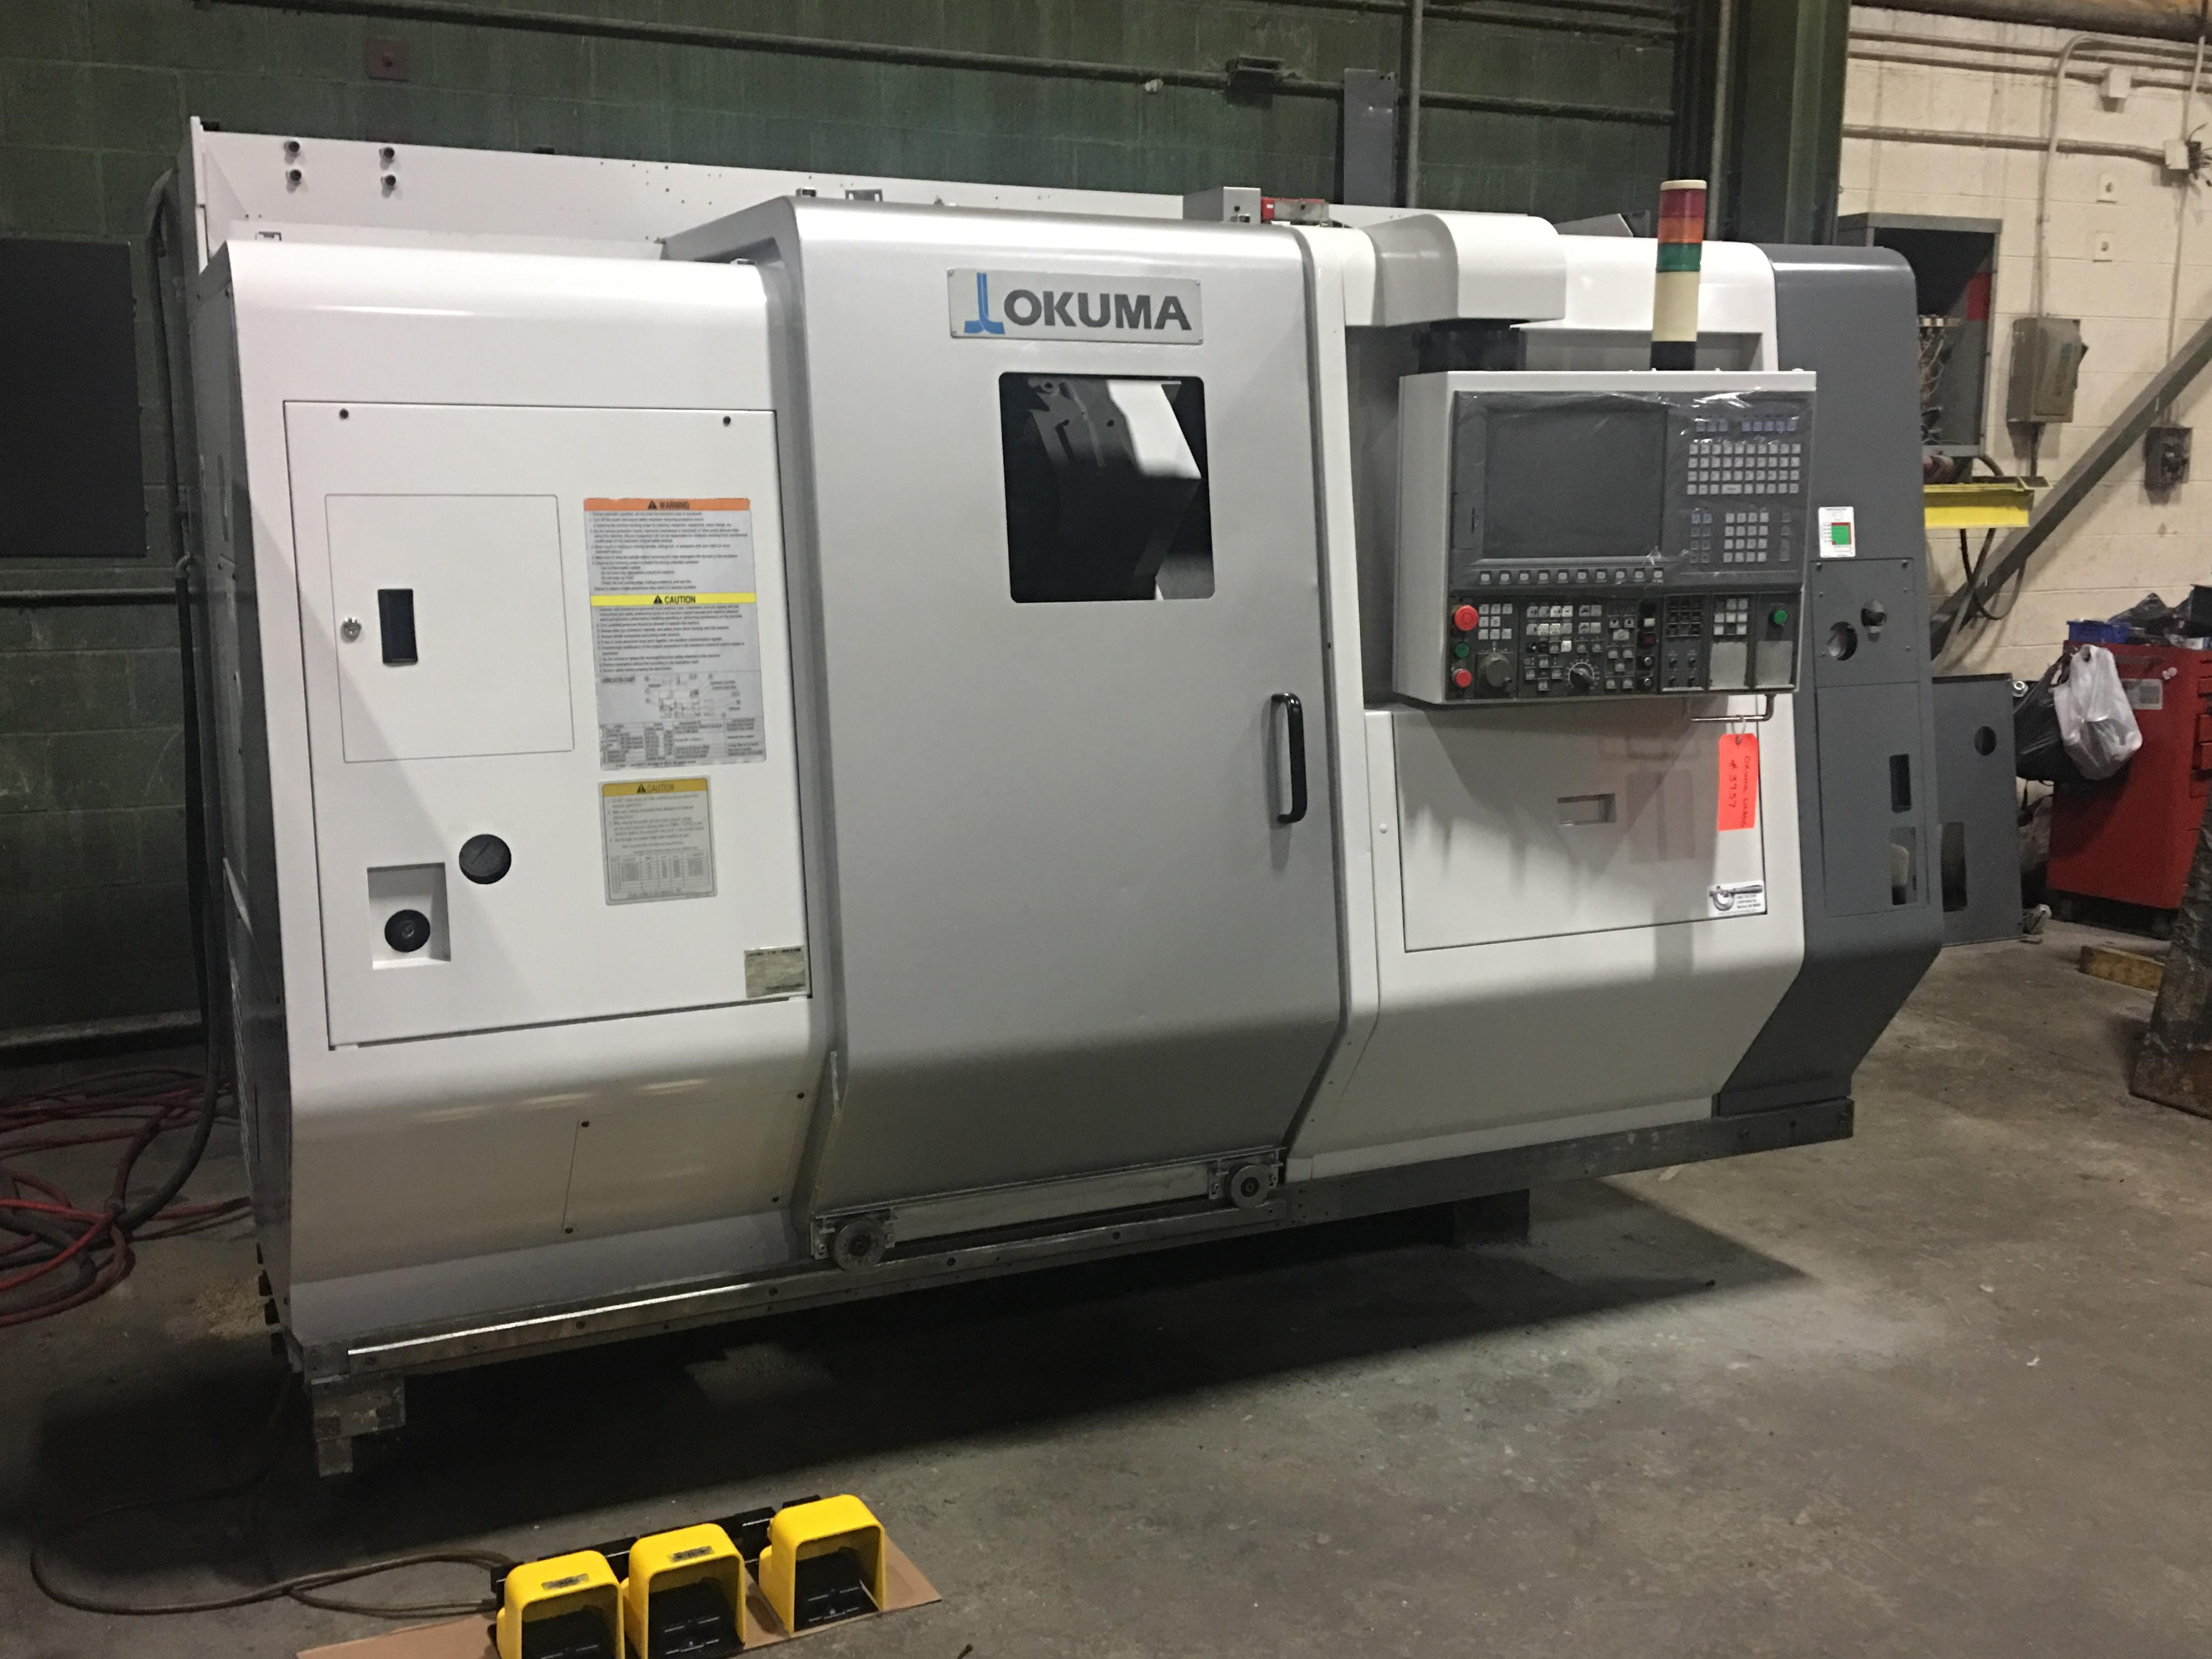 Okuma LU300 CNC Lathe